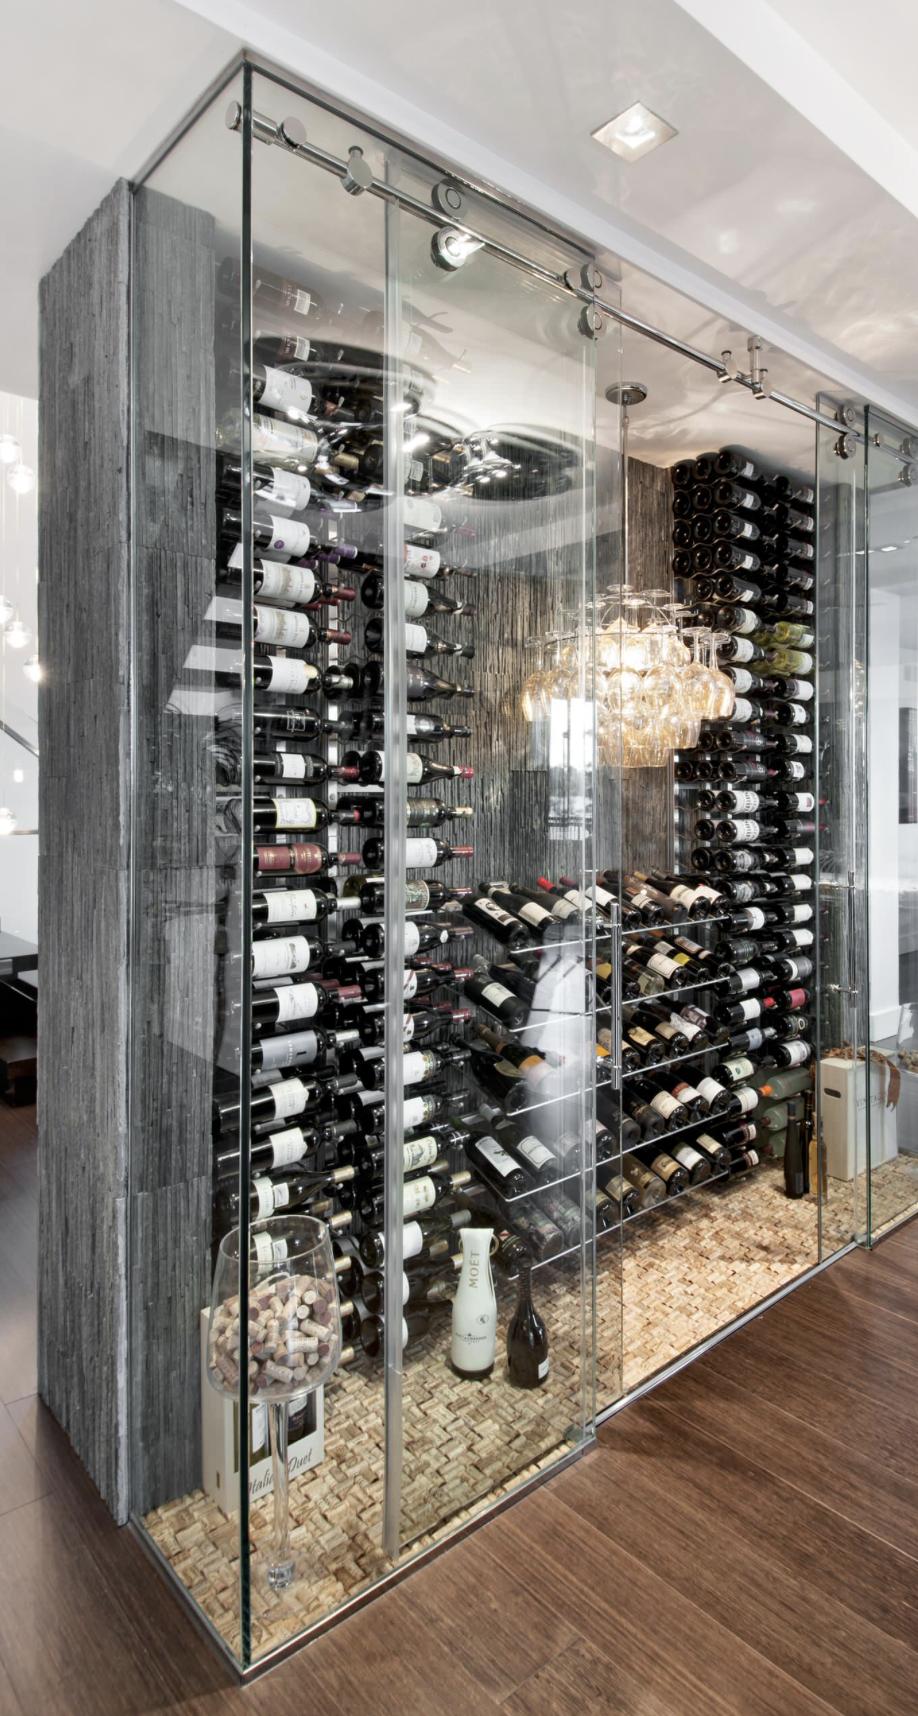 Wine Cellar Home Wine Cellars Glass Wine Cellar Wine Cellar Design